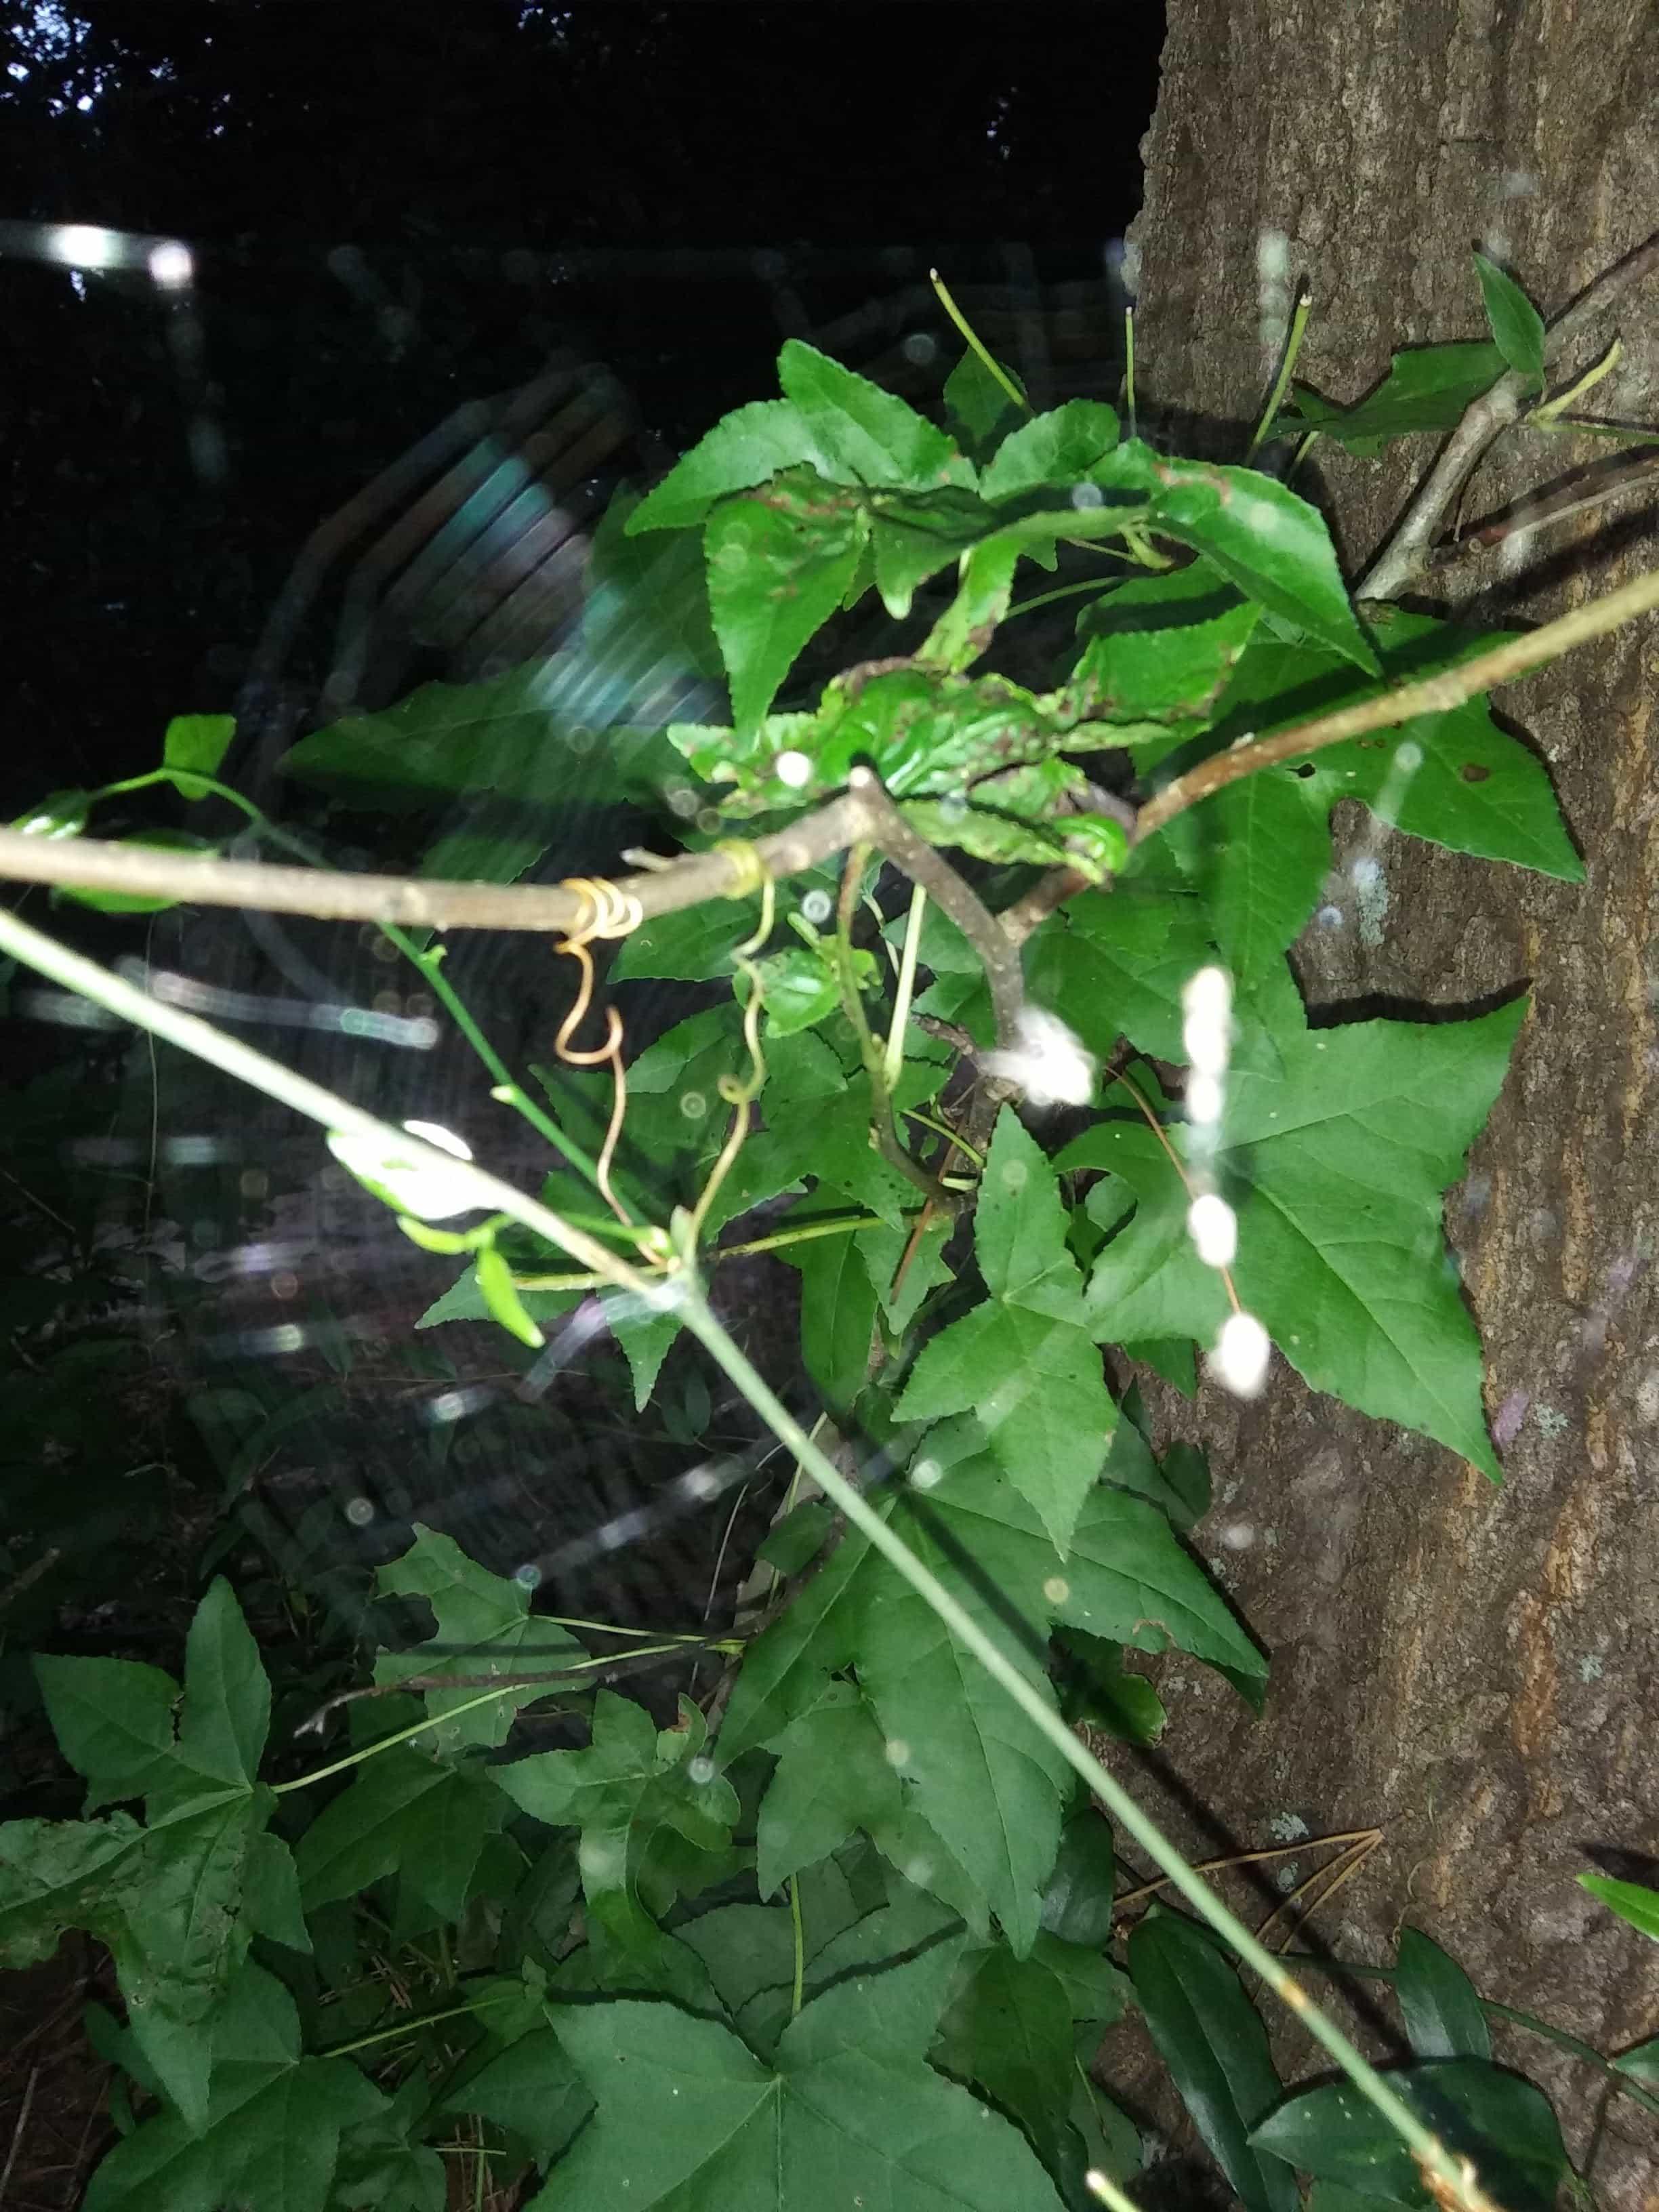 Picture of Mecynogea lemniscata (Basilica Orb-weaver) - Egg sacs,Webs